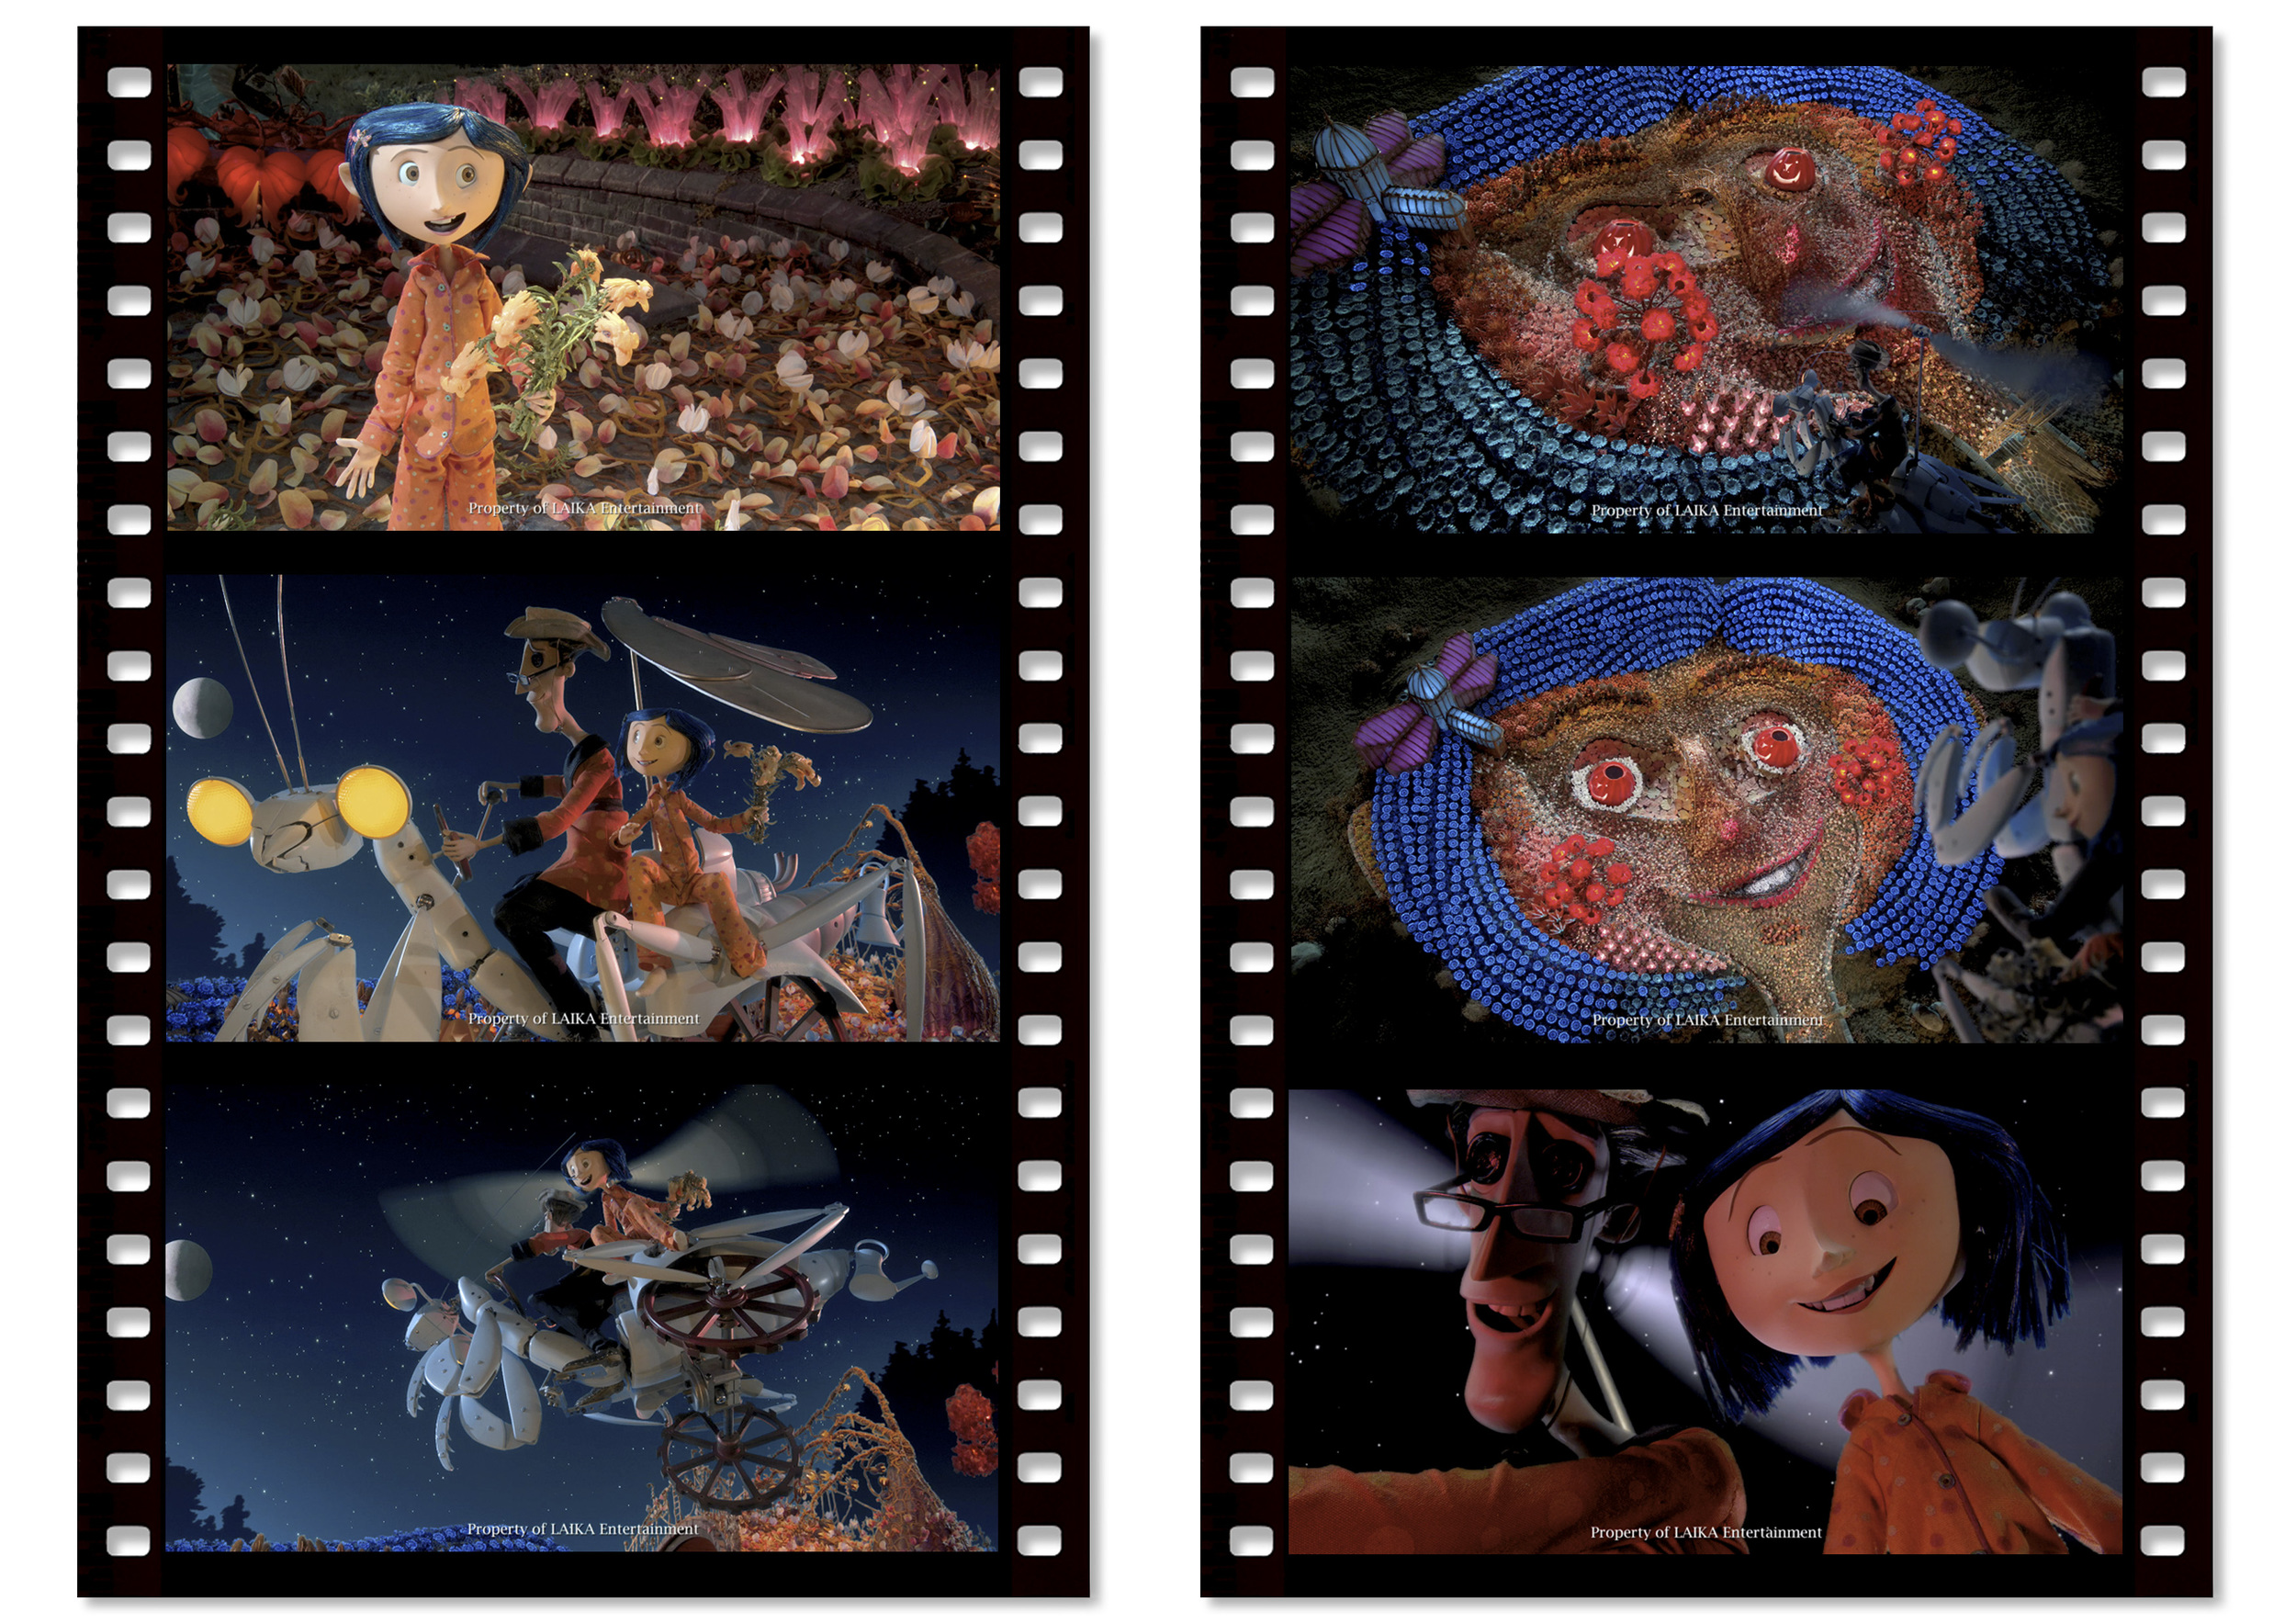 Coraline 6 images 6.jpg